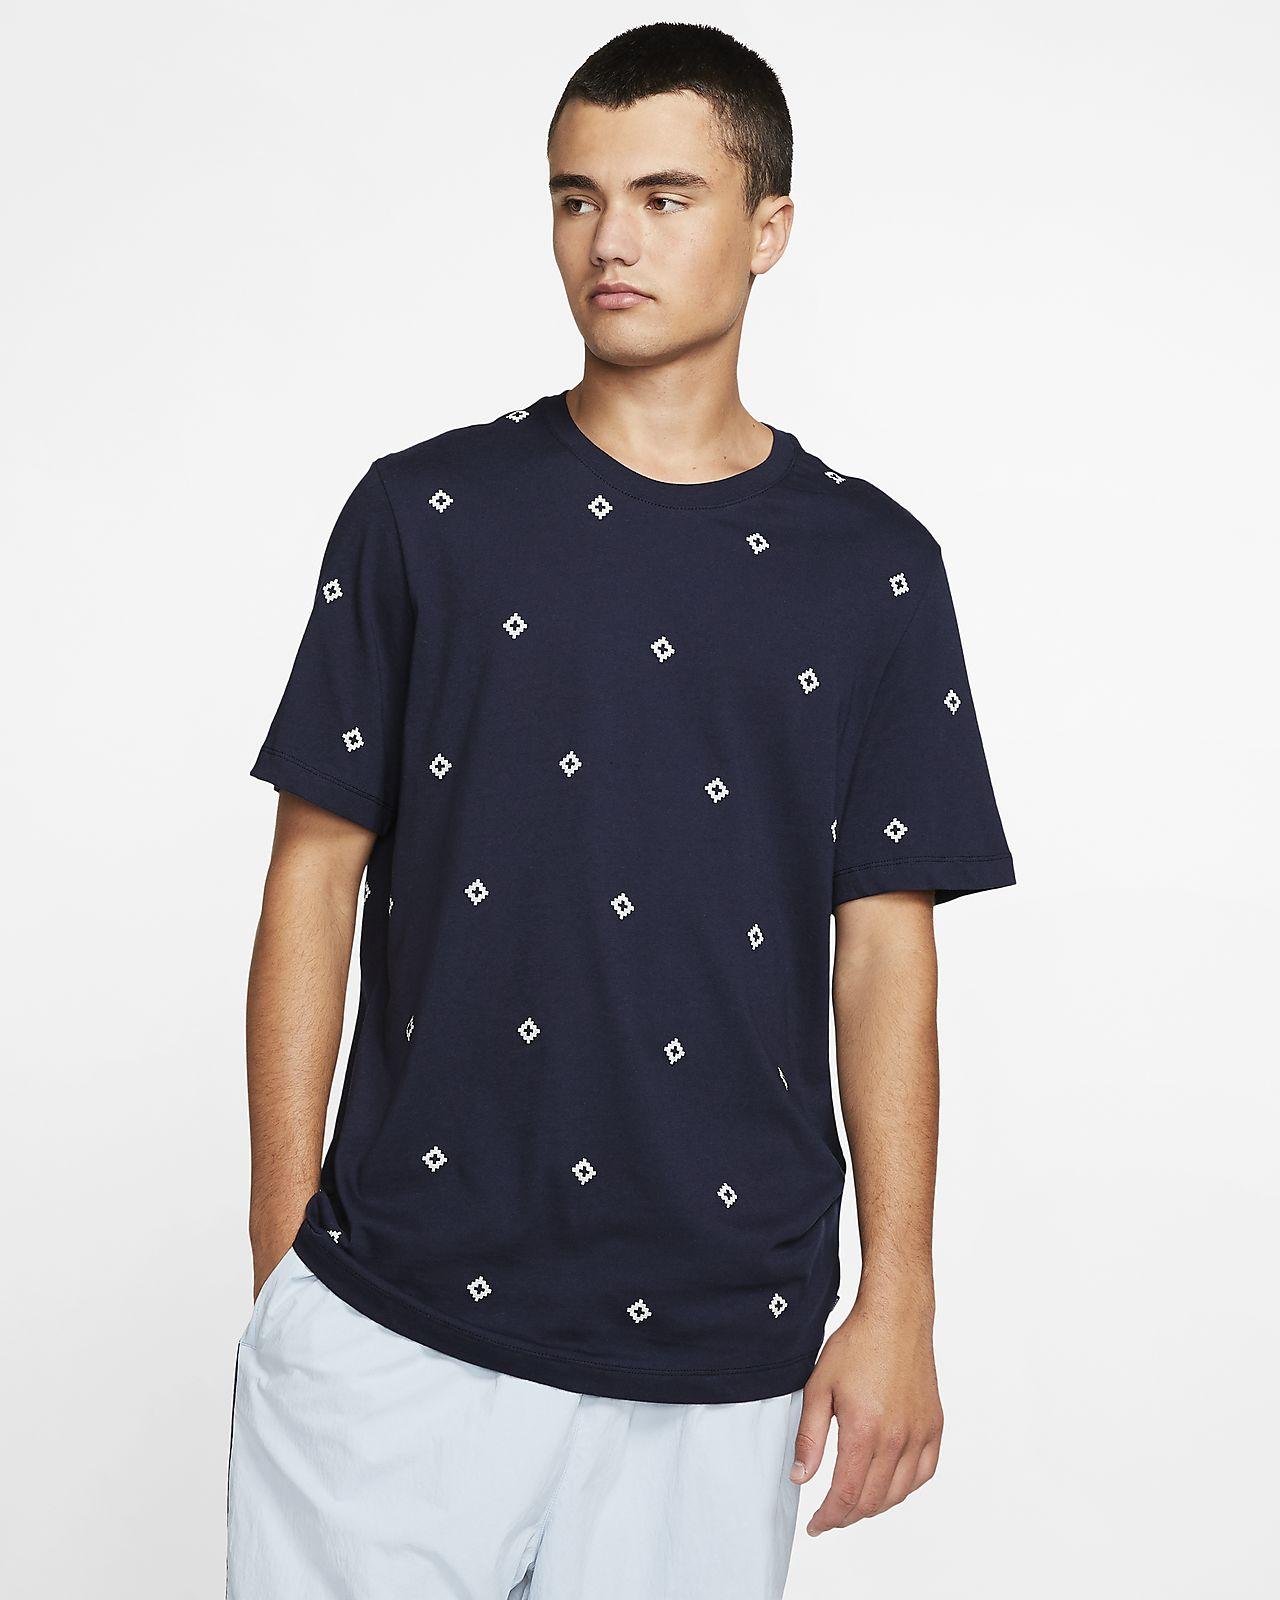 Nike SB Skateshirt met print voor heren